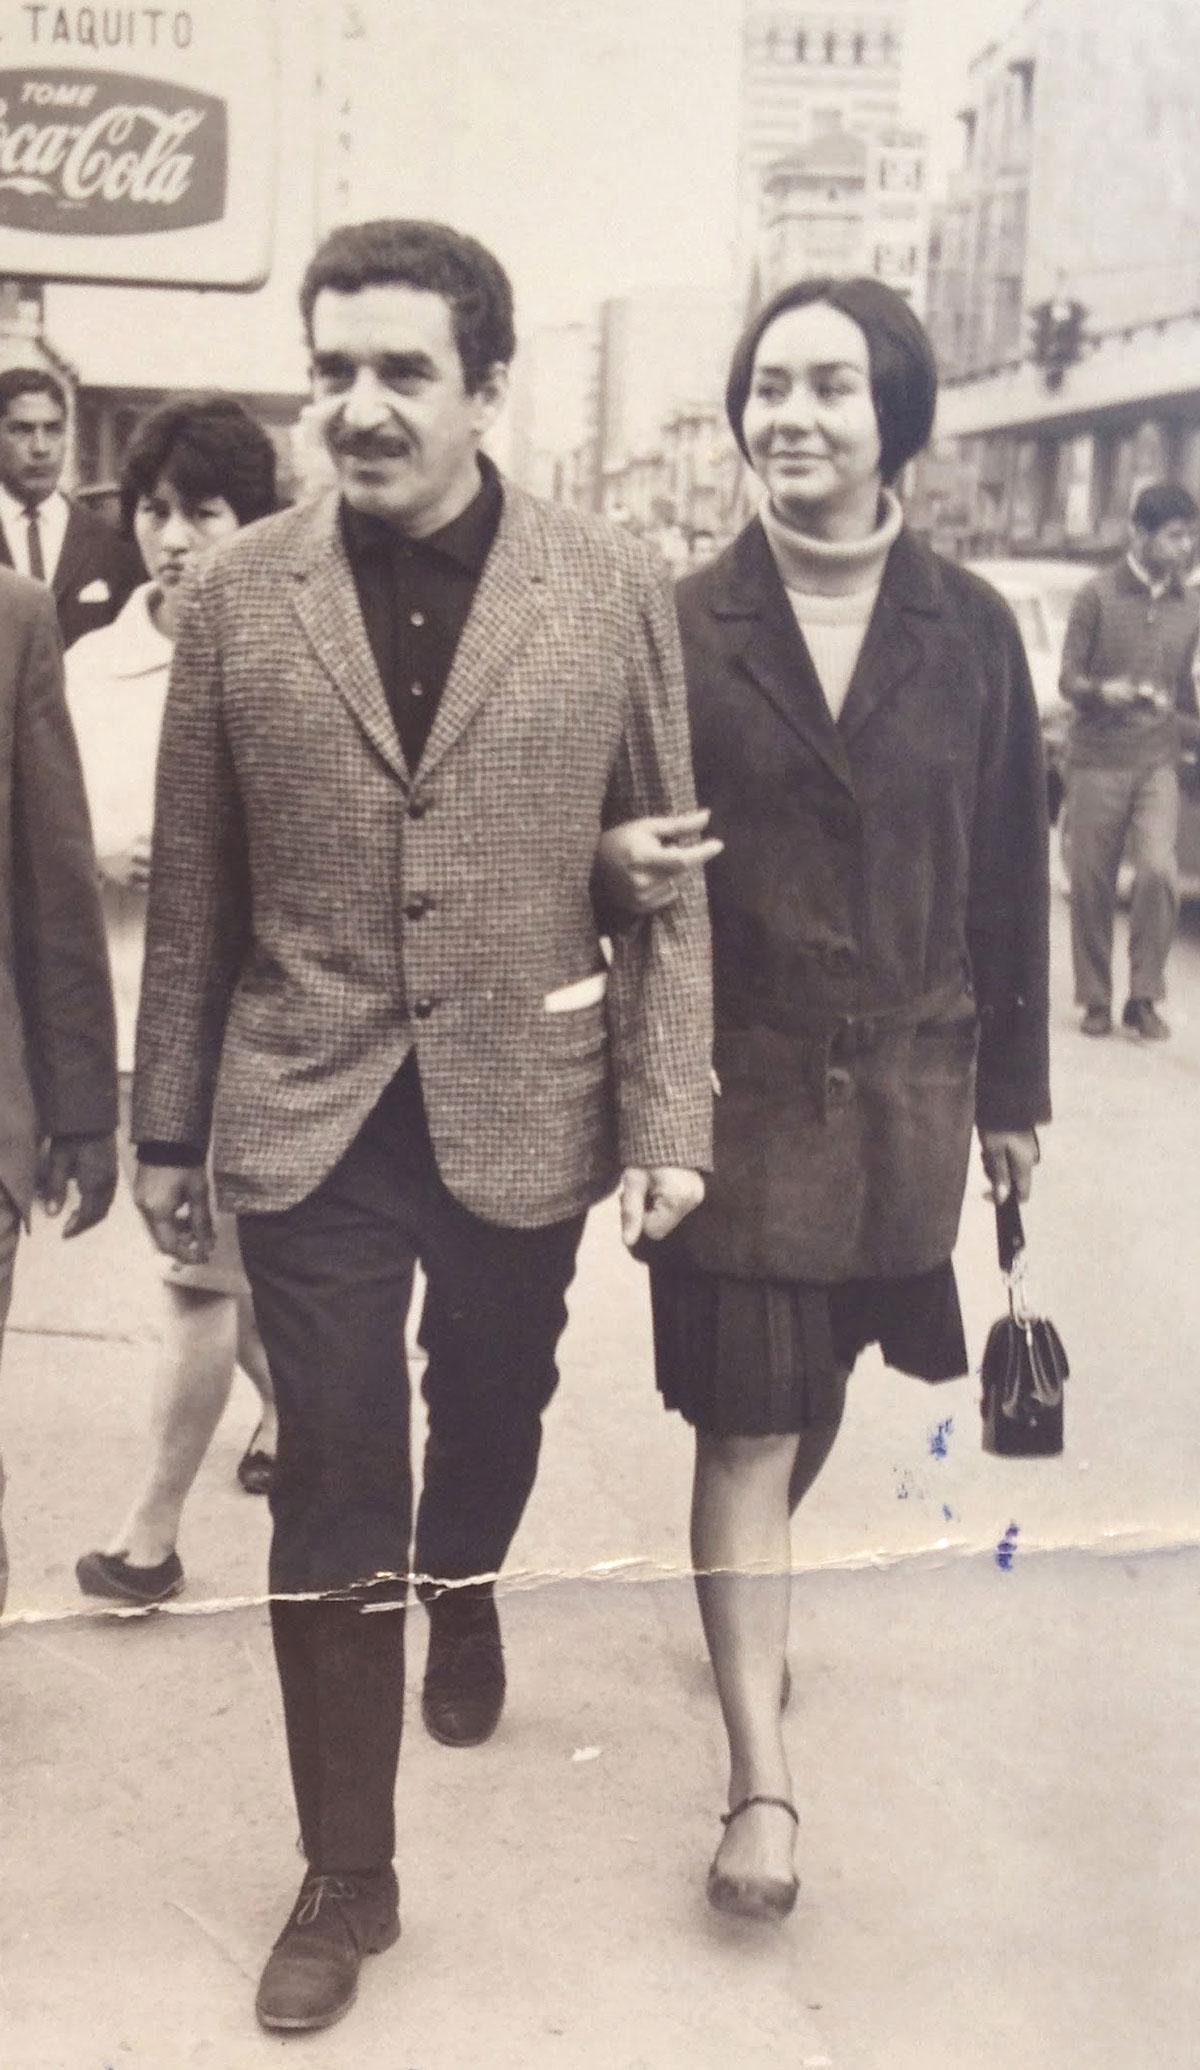 Gabriel García Márquez and his wife Mercedes in Bogota, 1967. / Gabriel García Márquez y su esposa, Mercedes, en Bogotá, 1967.